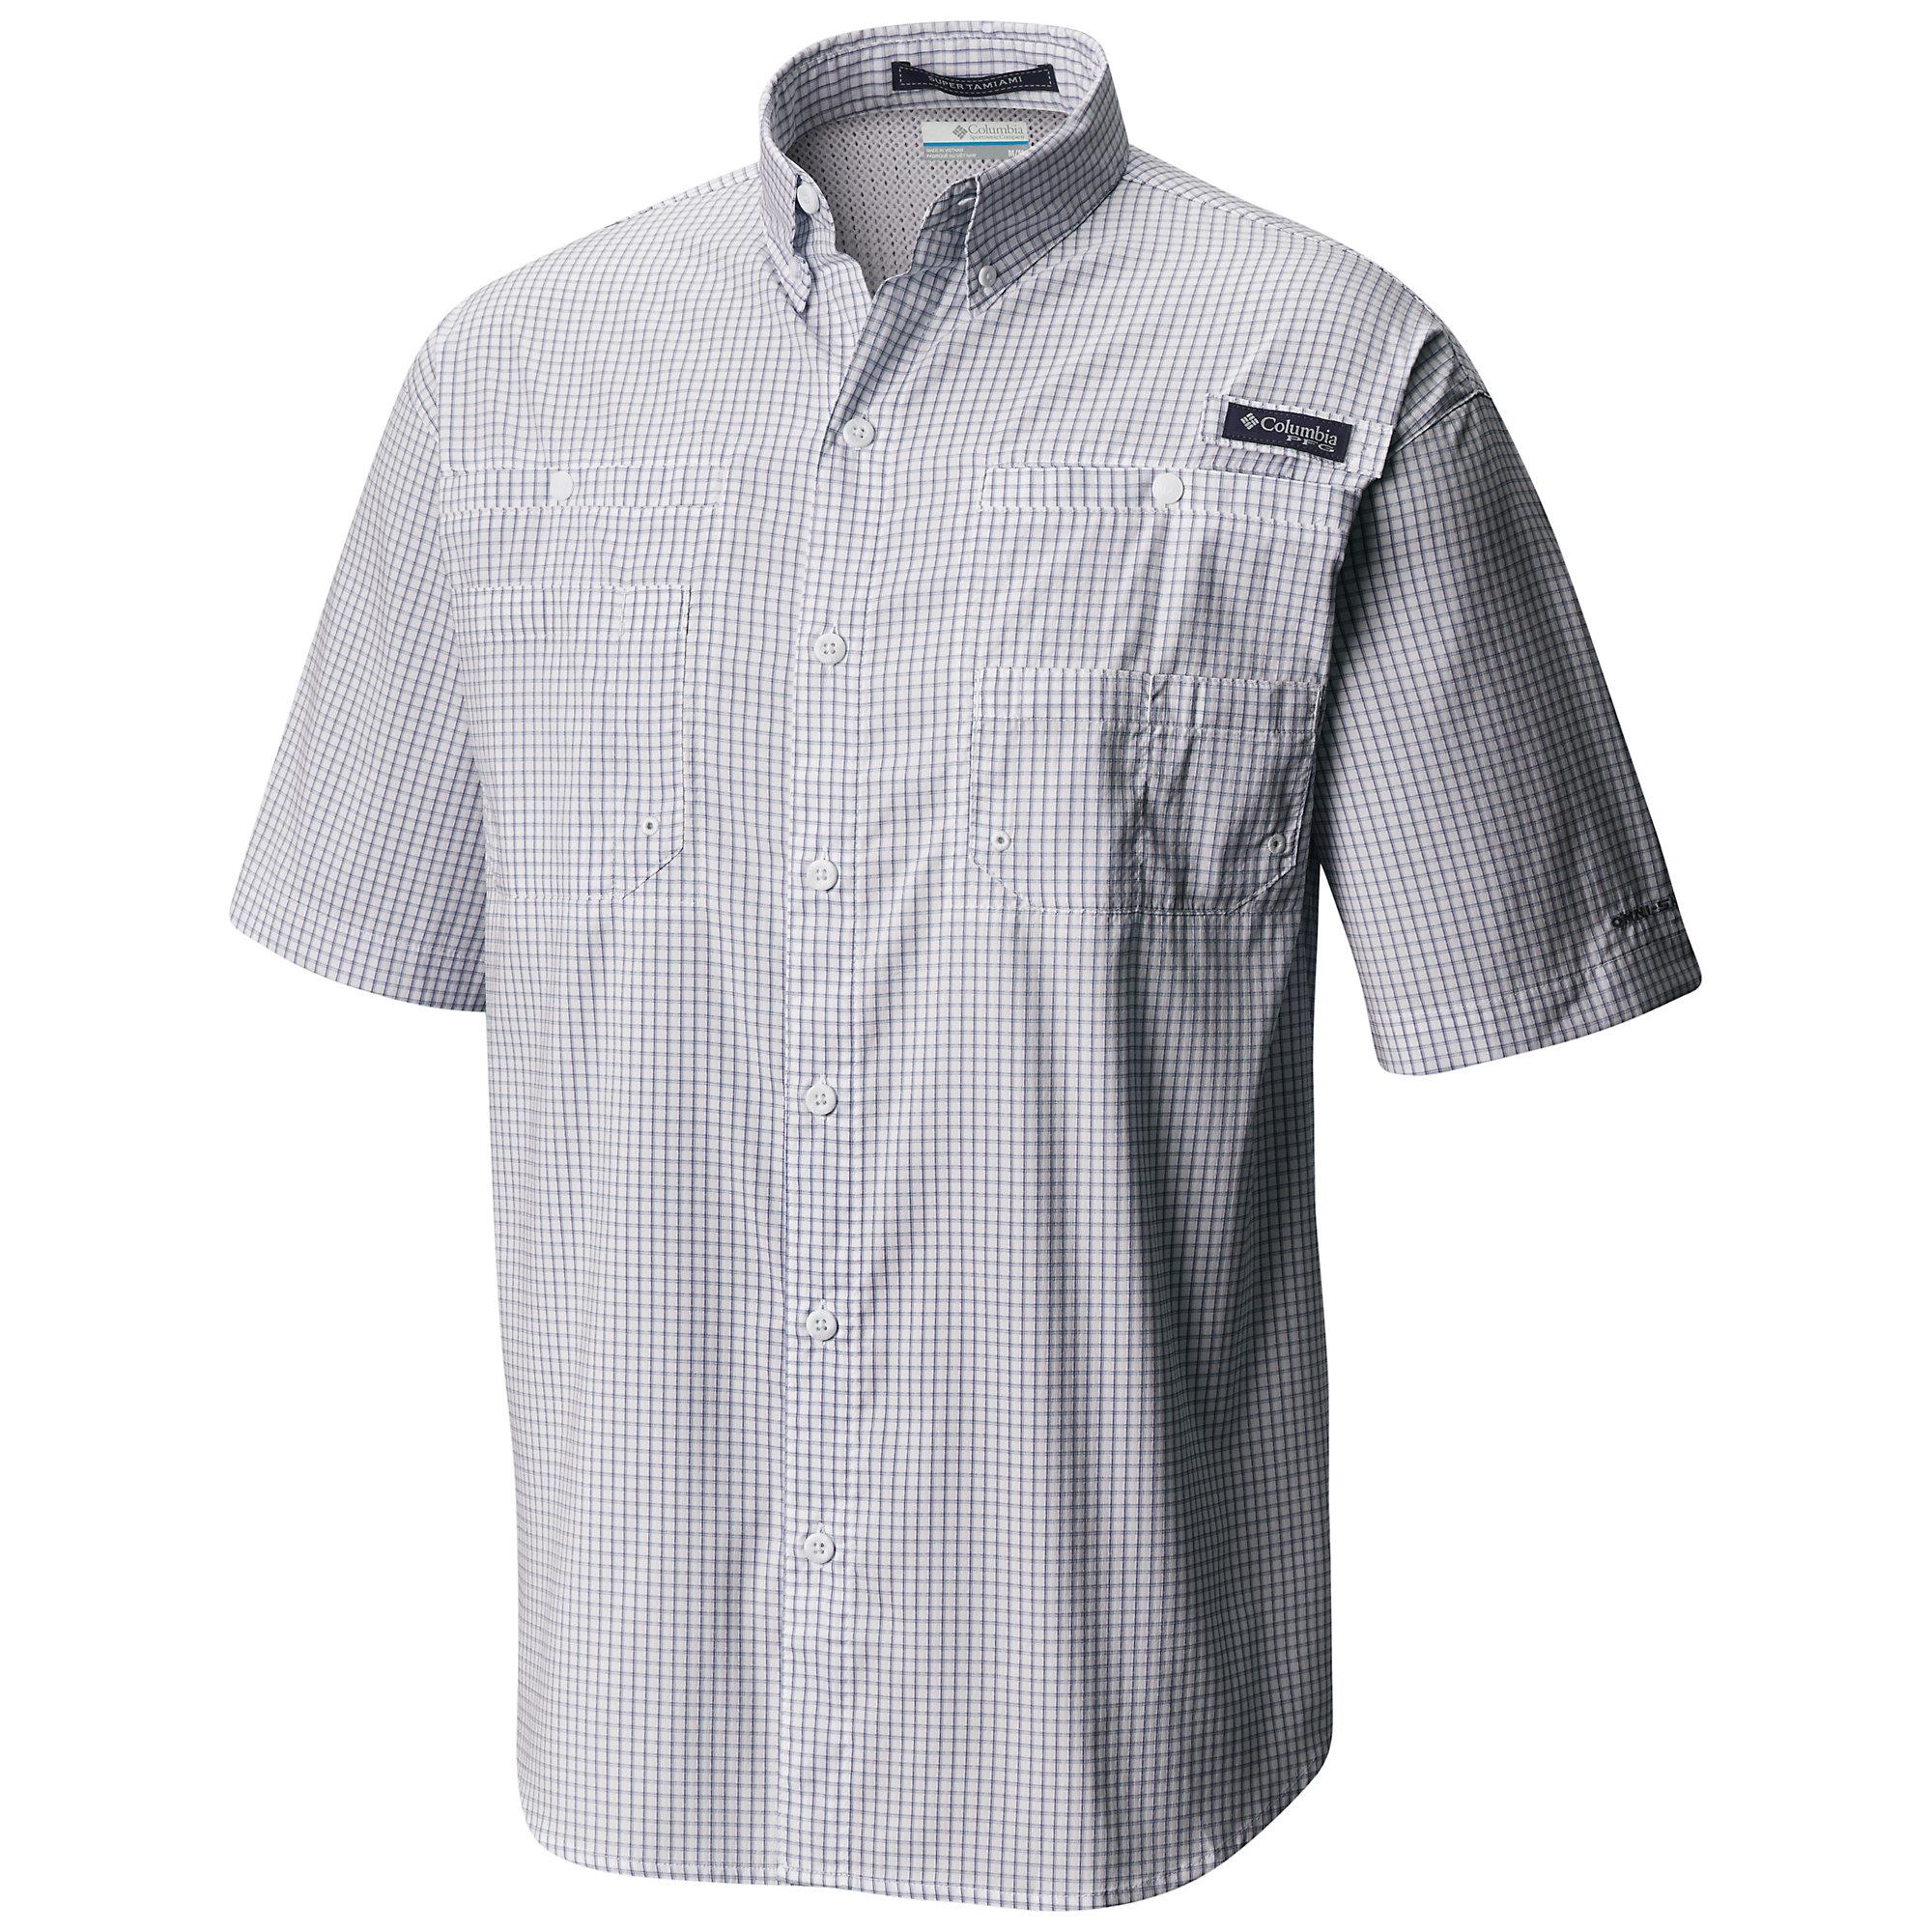 Columbia Super Tamiami Short Sleeve Shirt